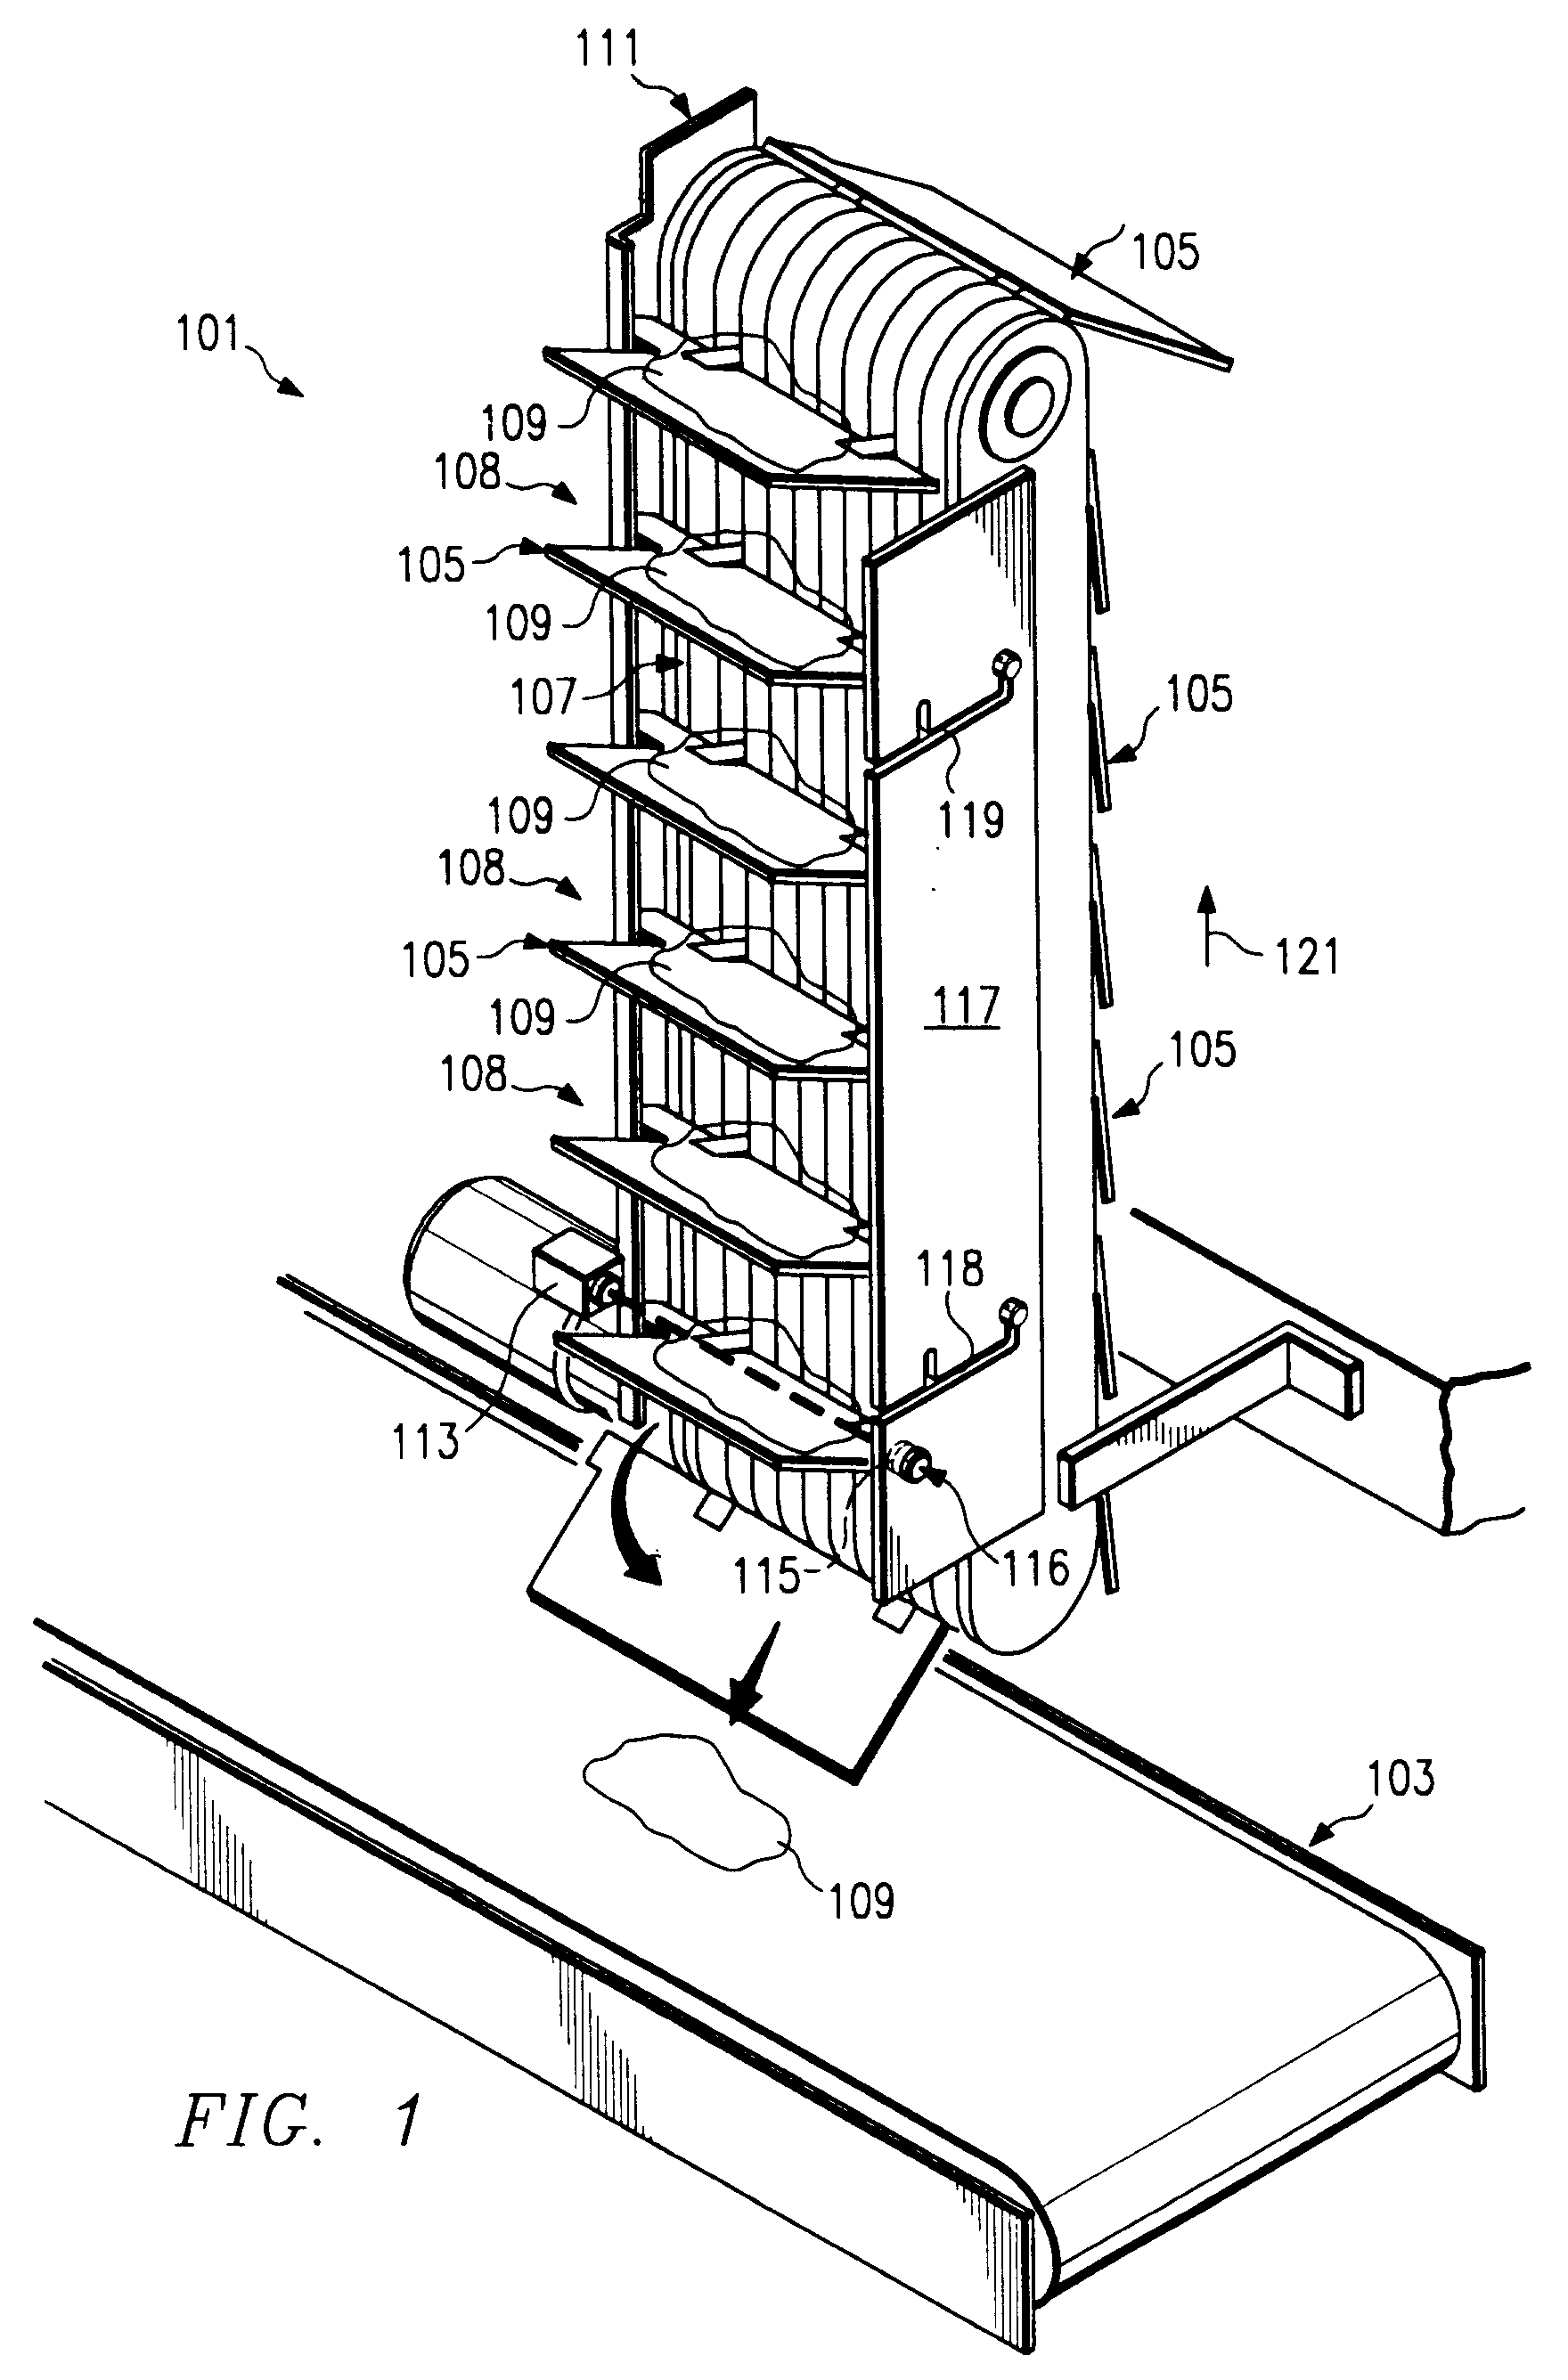 hight resolution of vertical conveyor belt google search conveyor belt retail design floor plans diagram